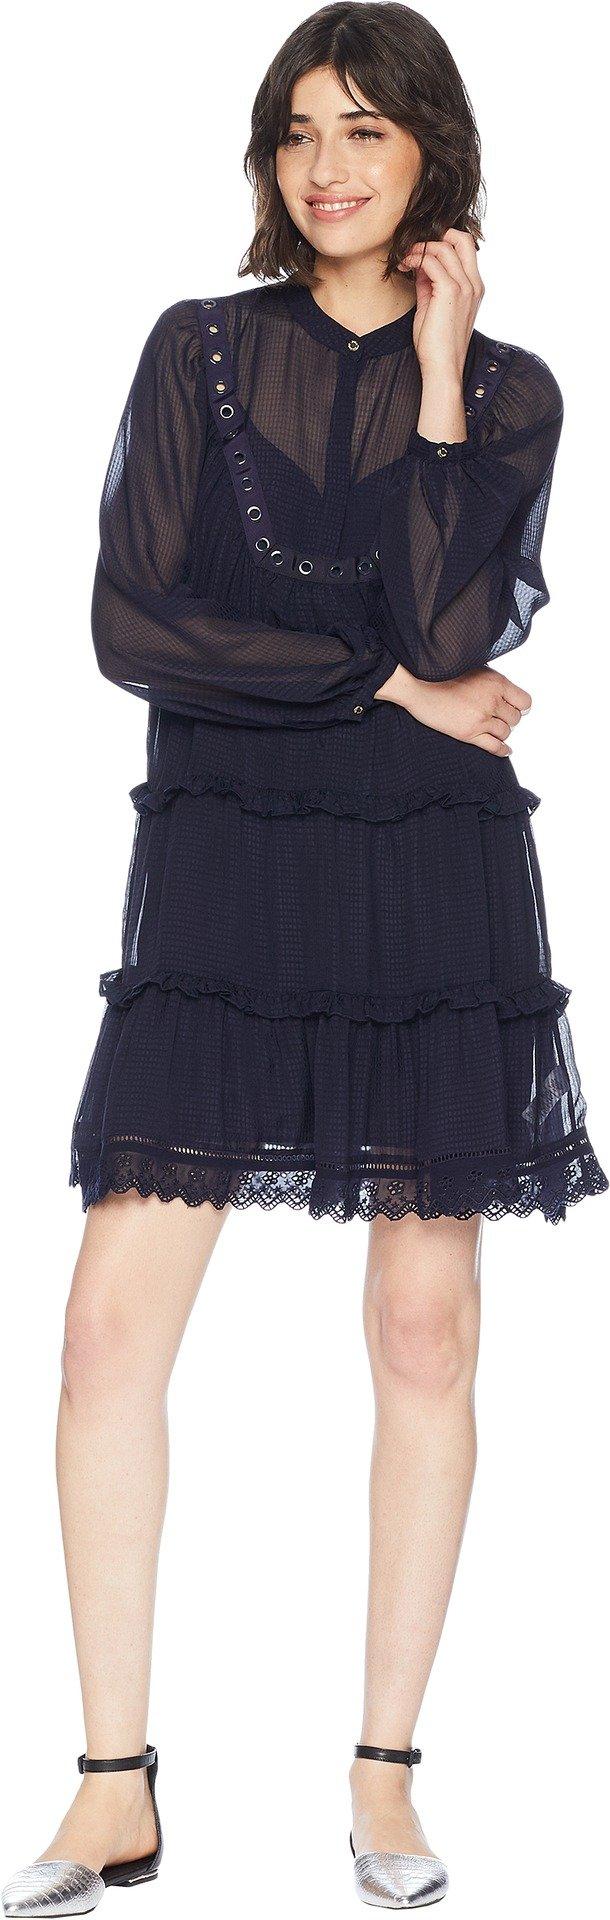 Juicy Couture Women's Seersucker Embroidered Trim Dress Zenith Petite/X-Small